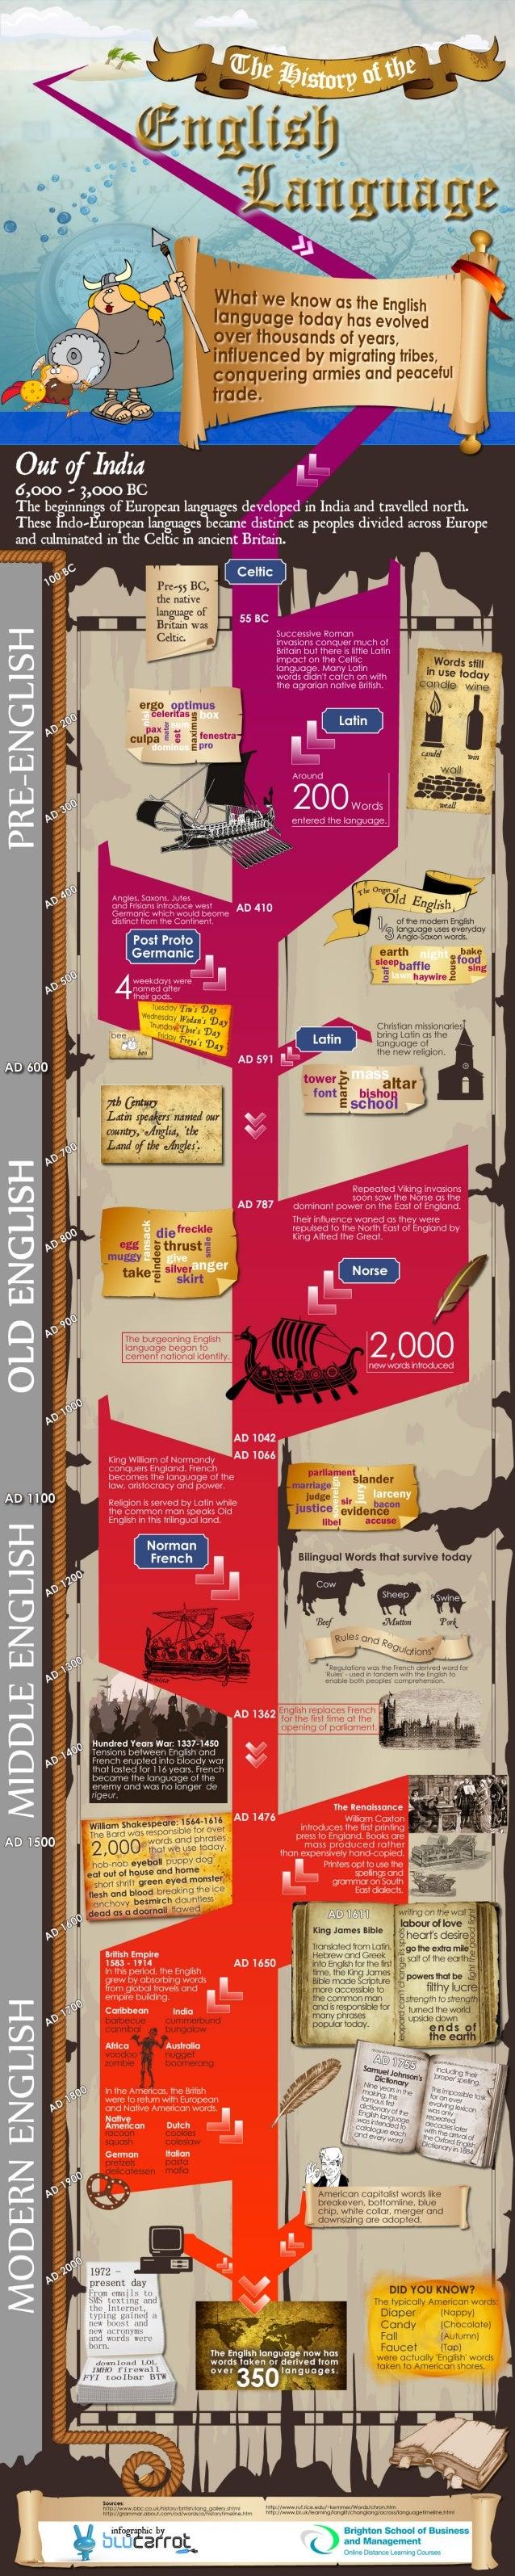 The History of English Language